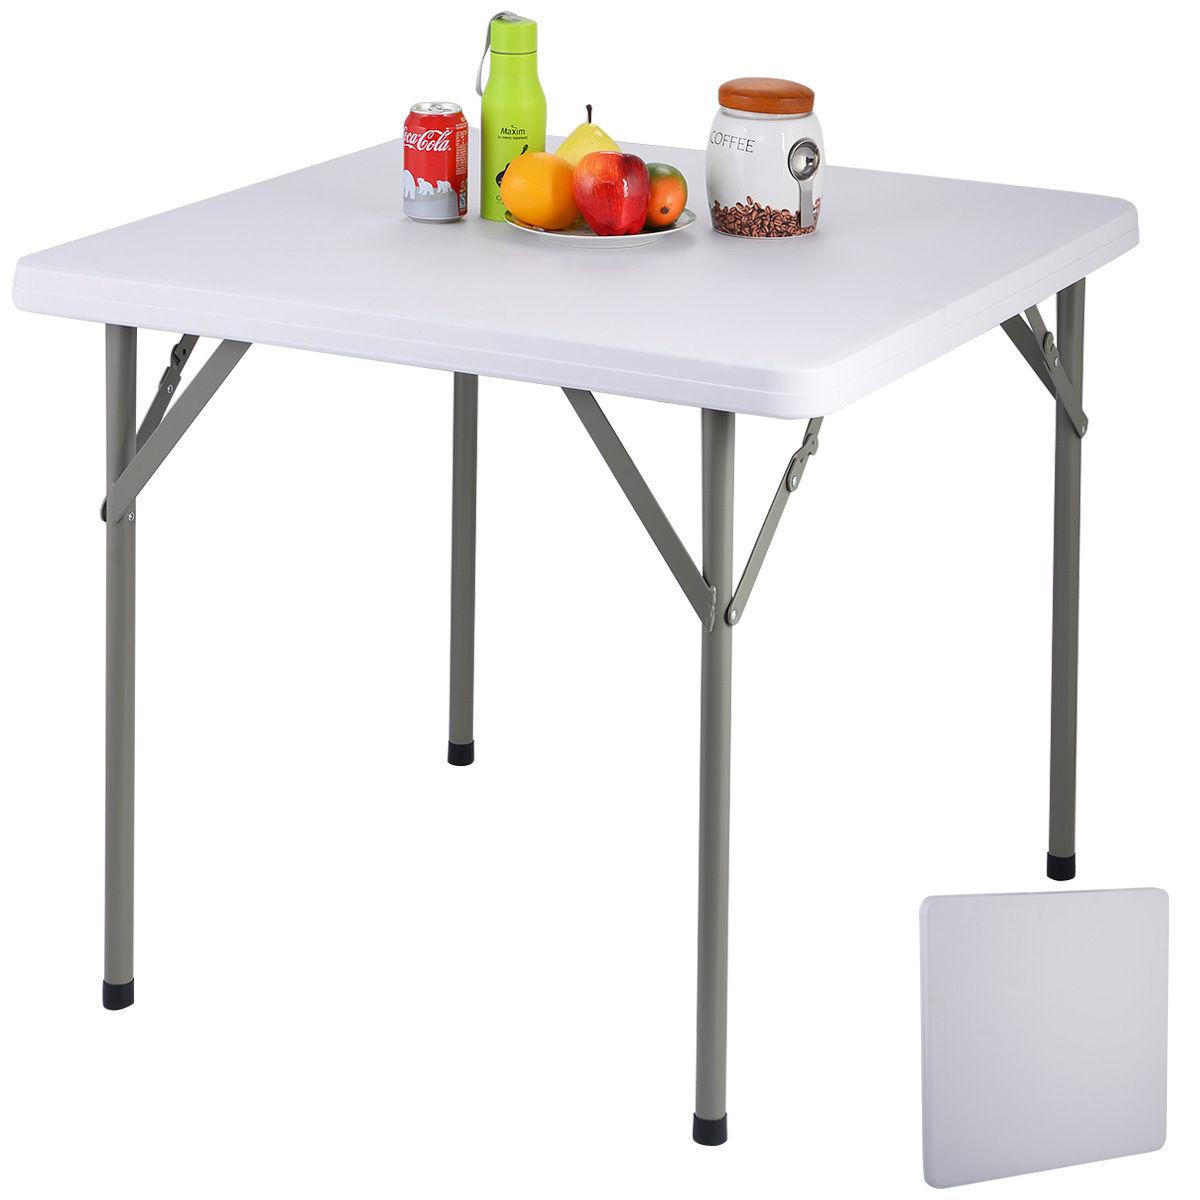 Multipurpose Table costway 34'' plastic portable square folding banquet table